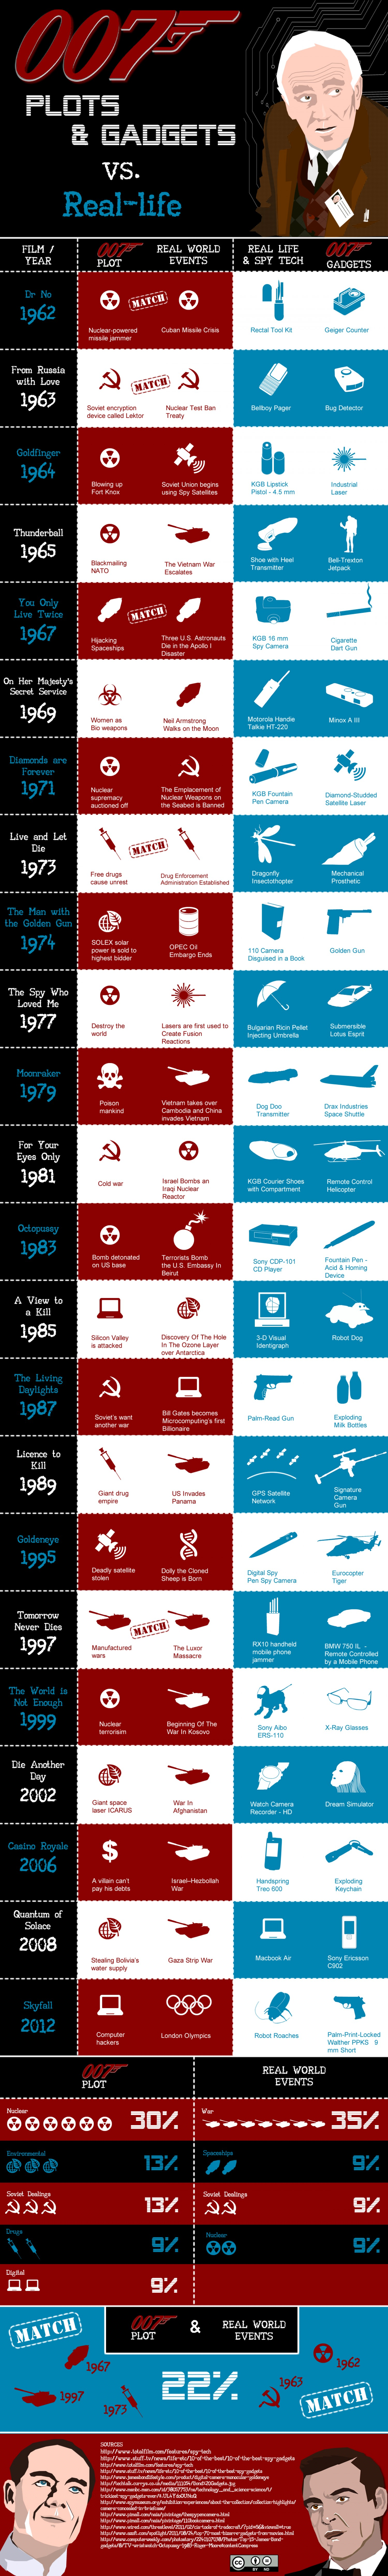 9. 50 years of 007 Plots & Gadgets vs. Real Life